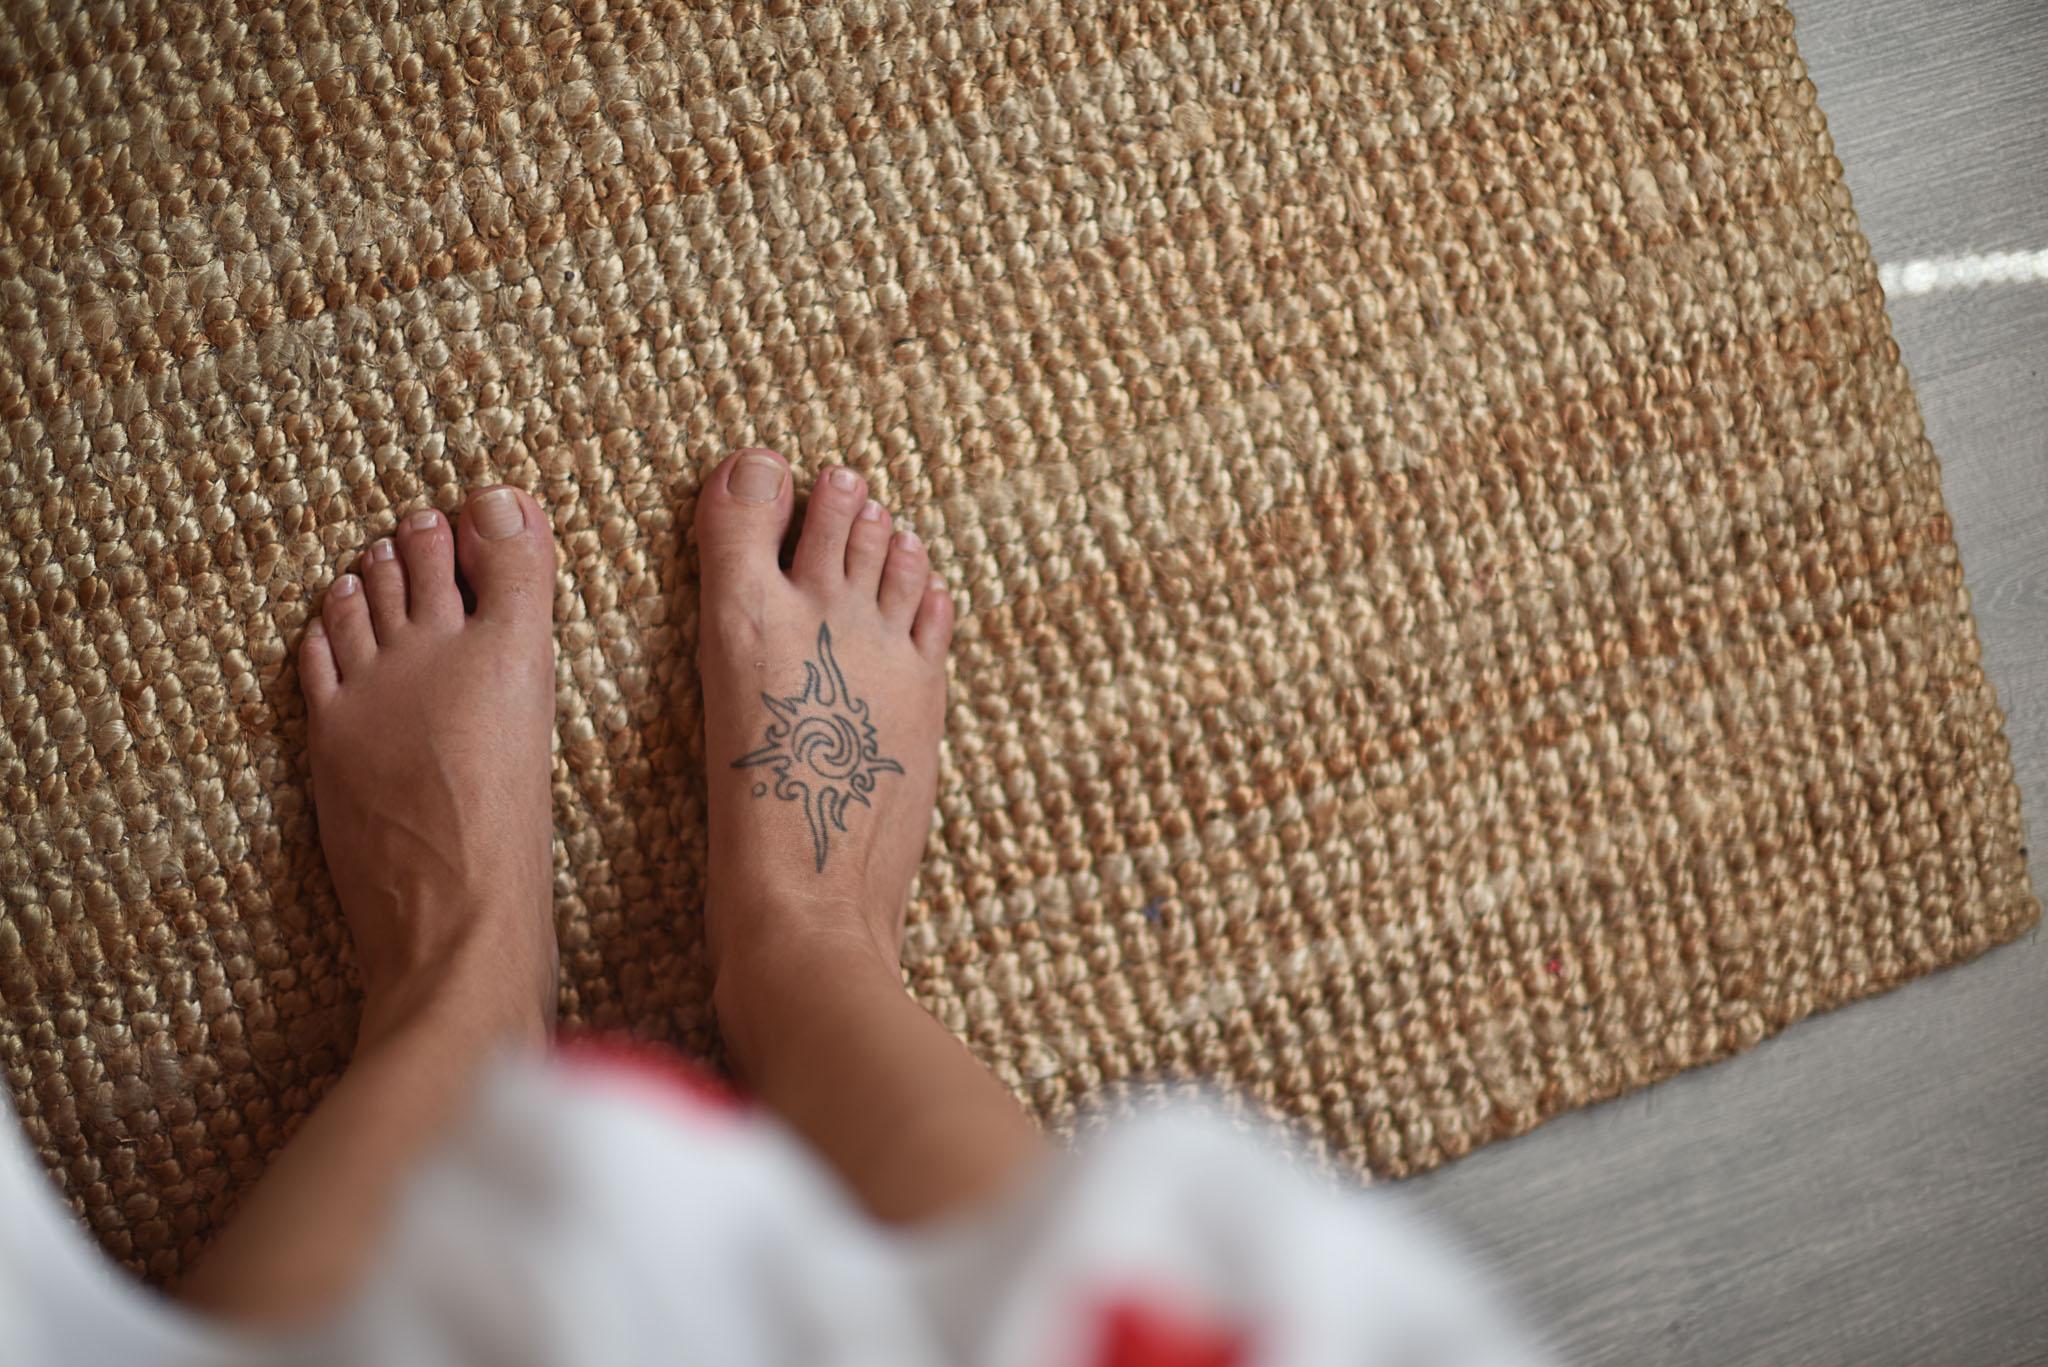 Recouvrir son tatouage à Rennes